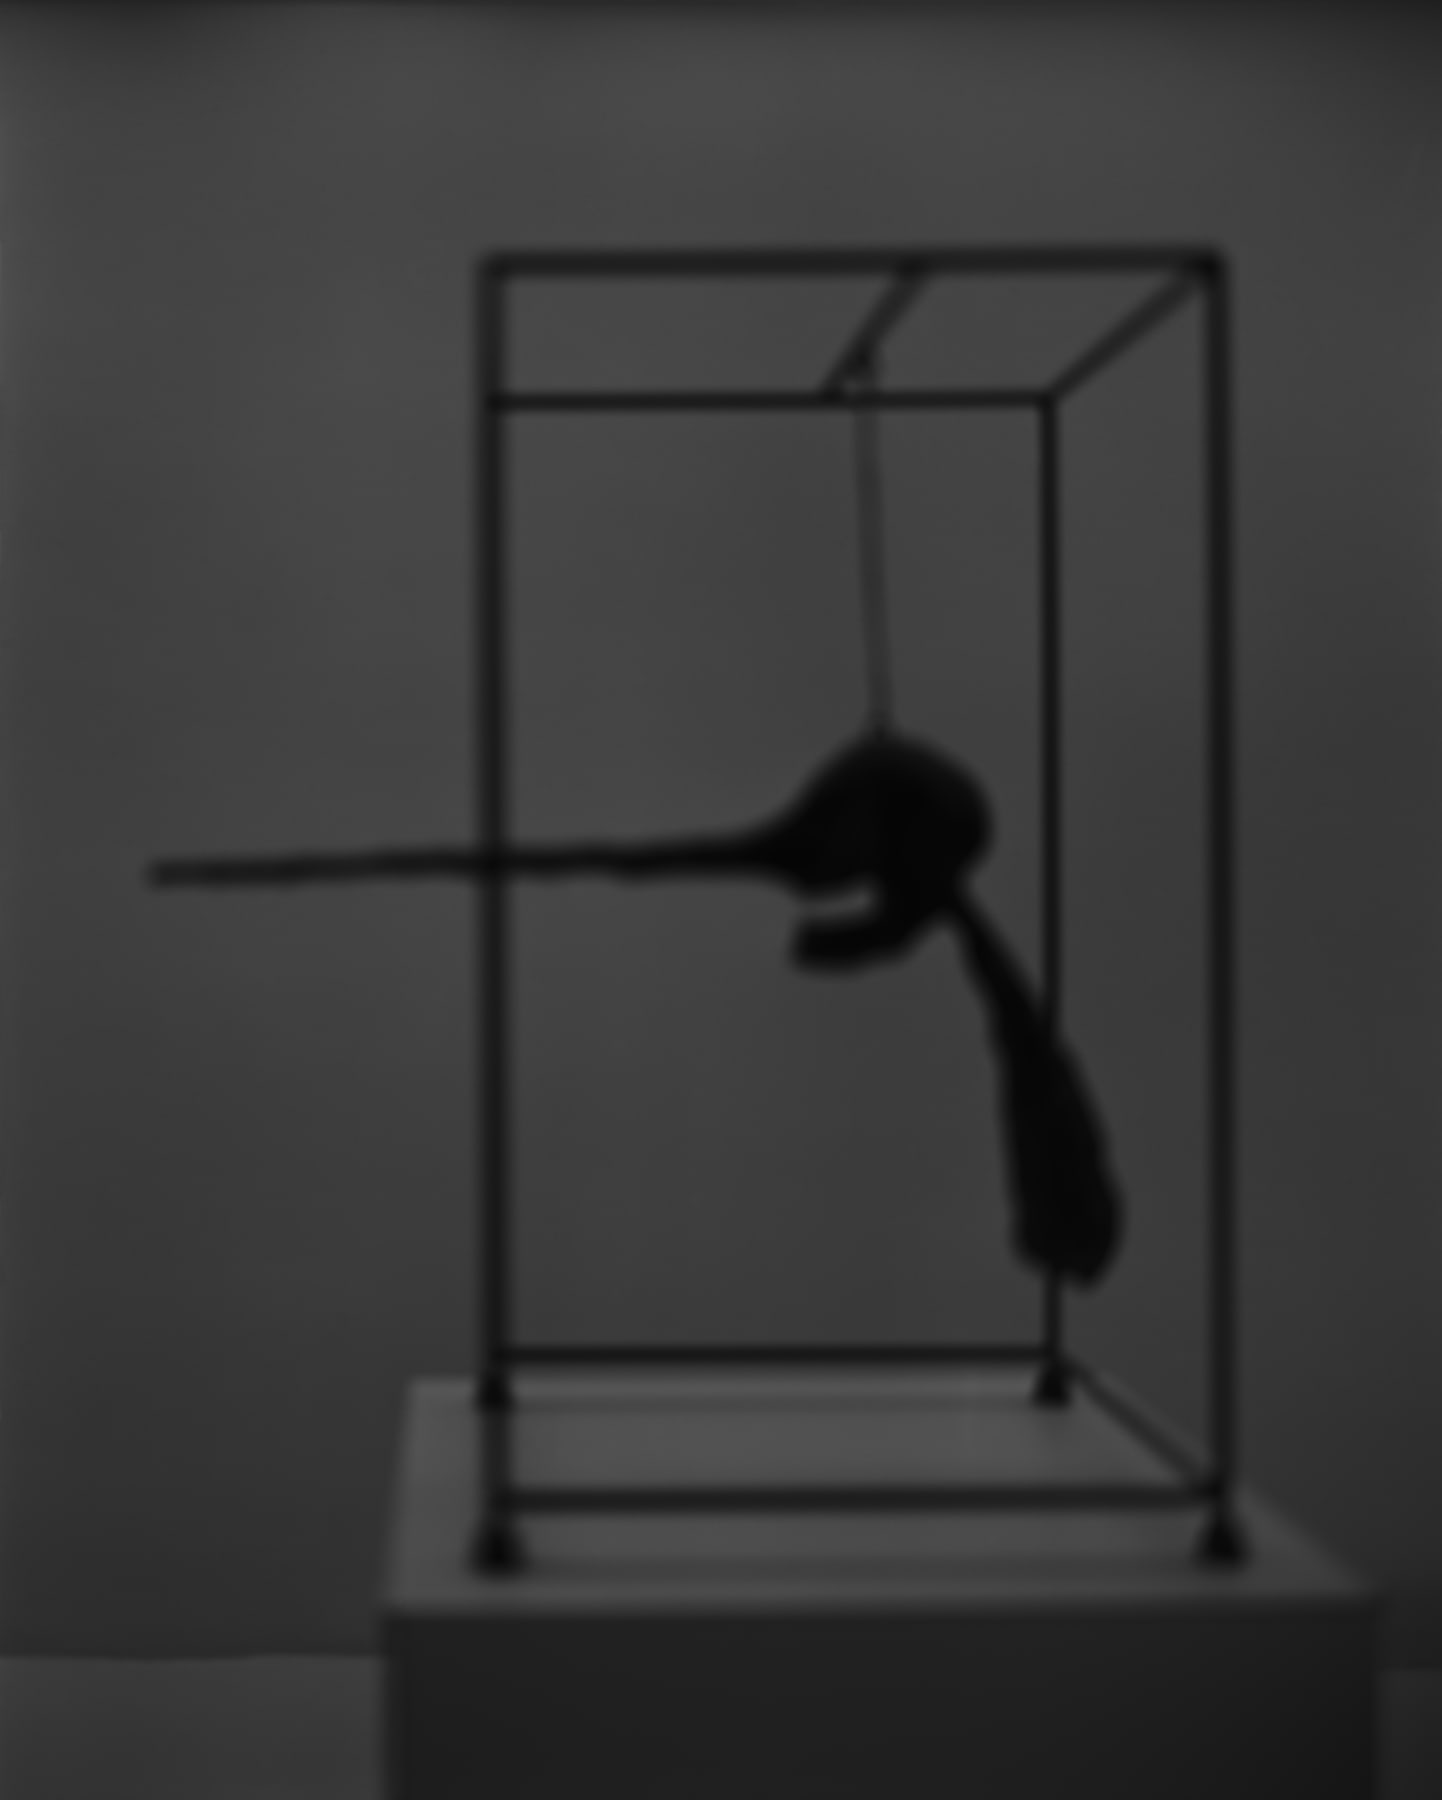 Hiroshi Sugimoto, Past Presence 090, The Nose, Alberto Giacometti, 2018